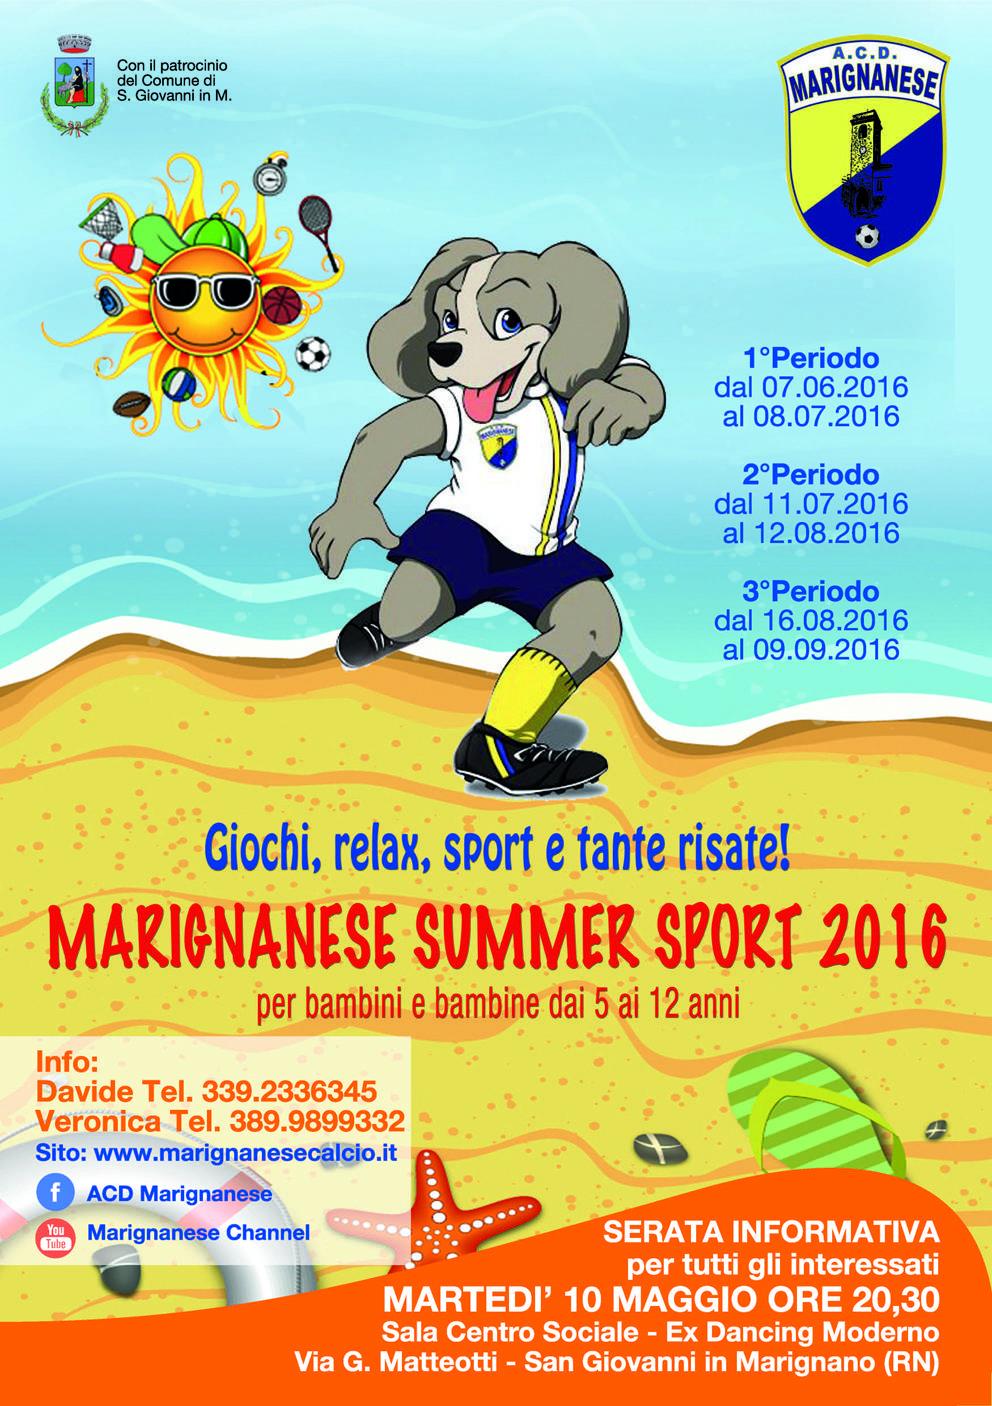 Marignanese Summer Sport